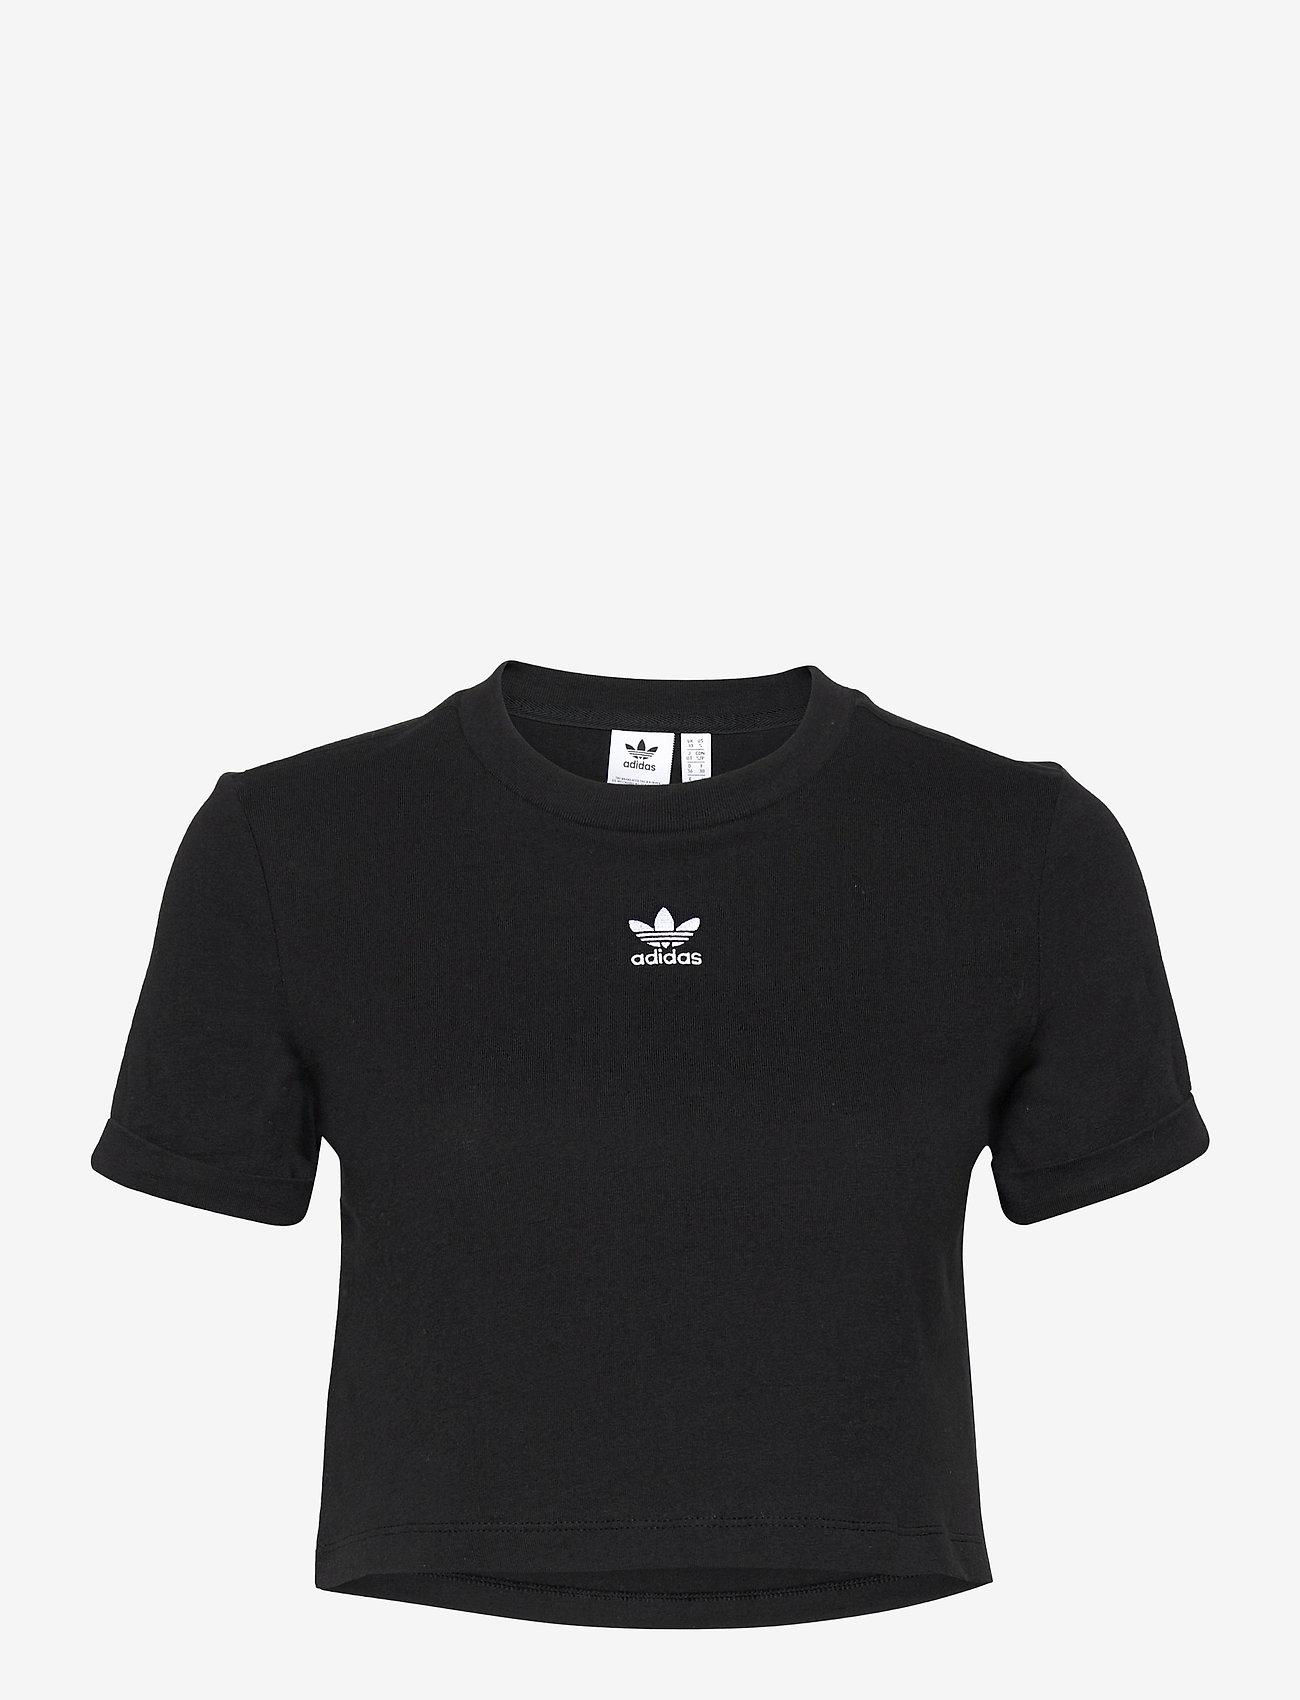 adidas Originals - Adicolor Classics Roll-Up Sleeve Crop Top W - crop tops - black - 1